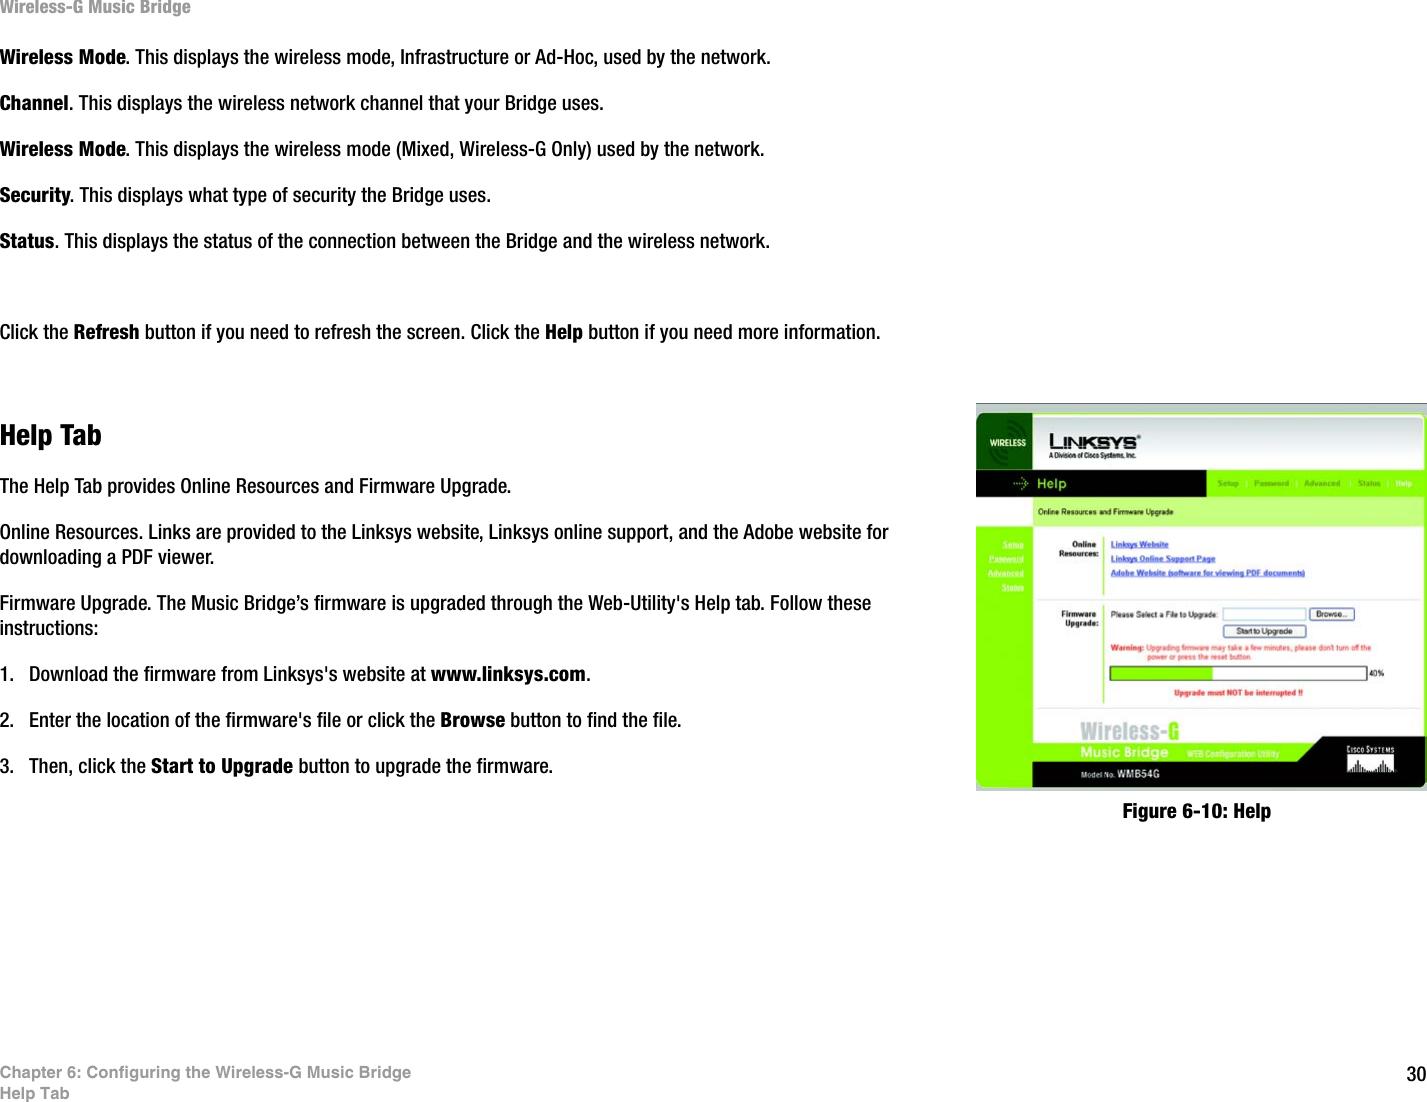 LINKSYS WMB54G Wireless-G Music Bridge User Manual Book